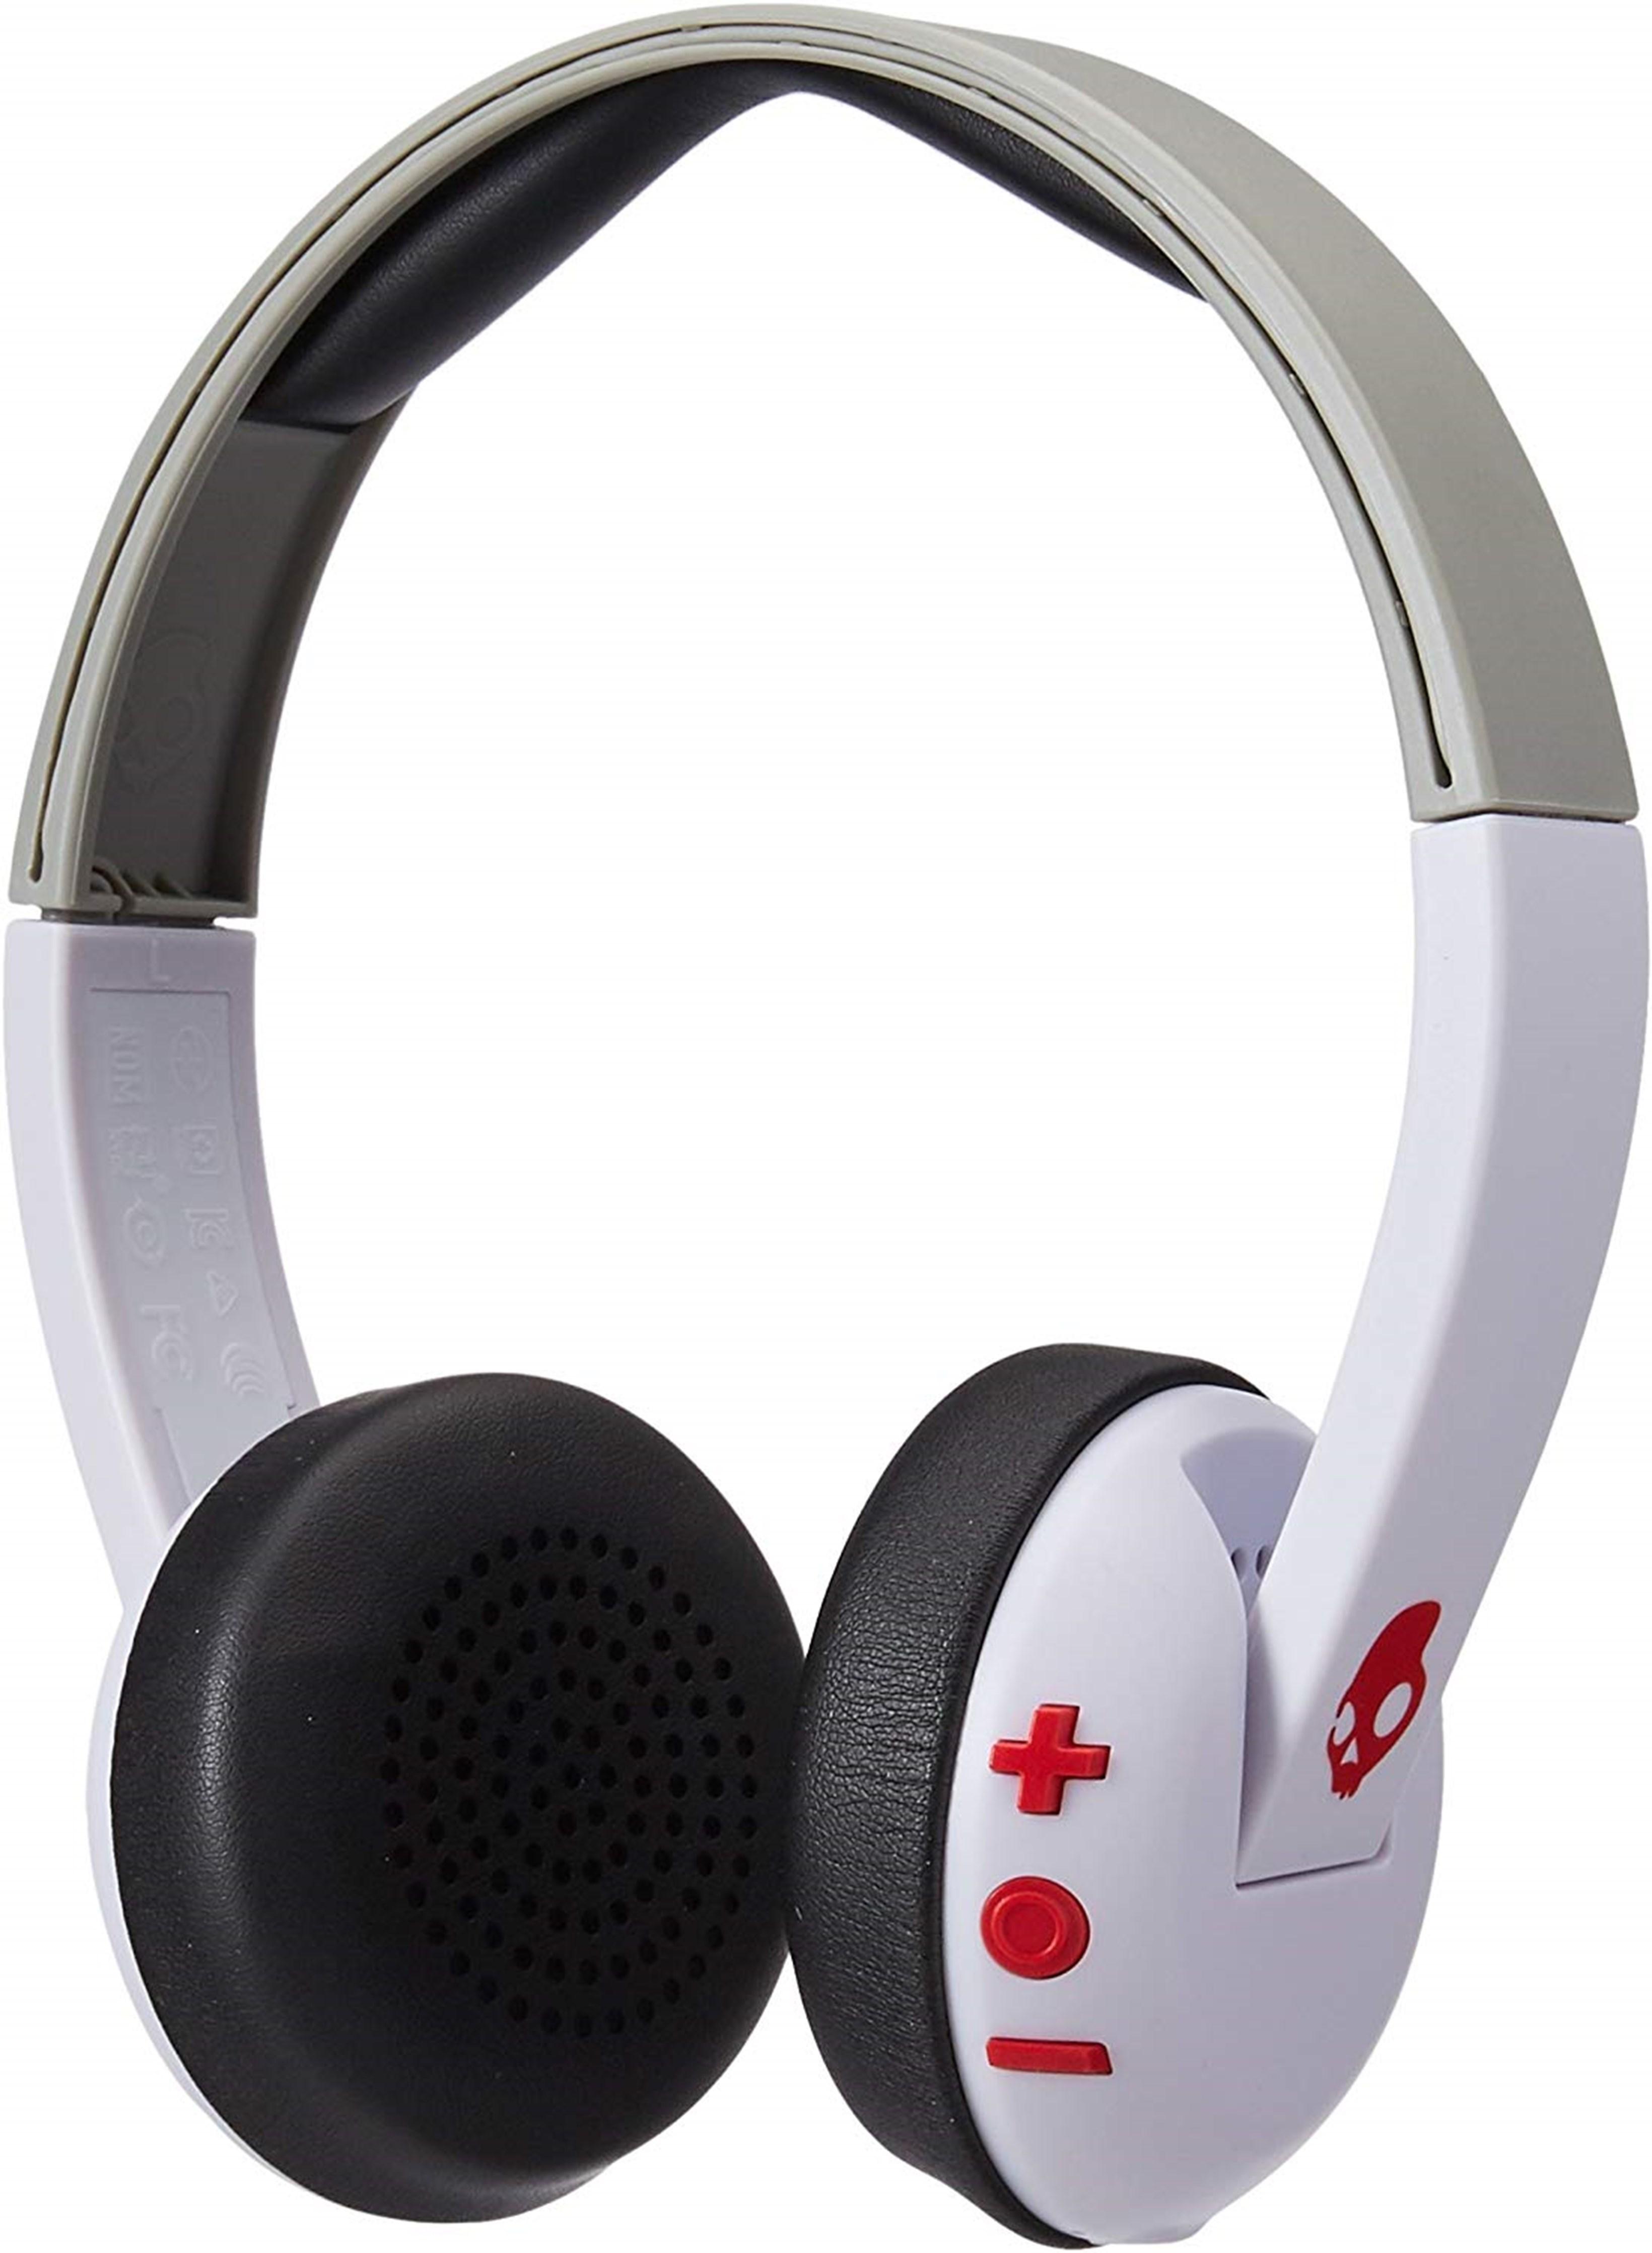 Skullcandy Uproar White/Grey/Red Bluetooth Headphones - 1